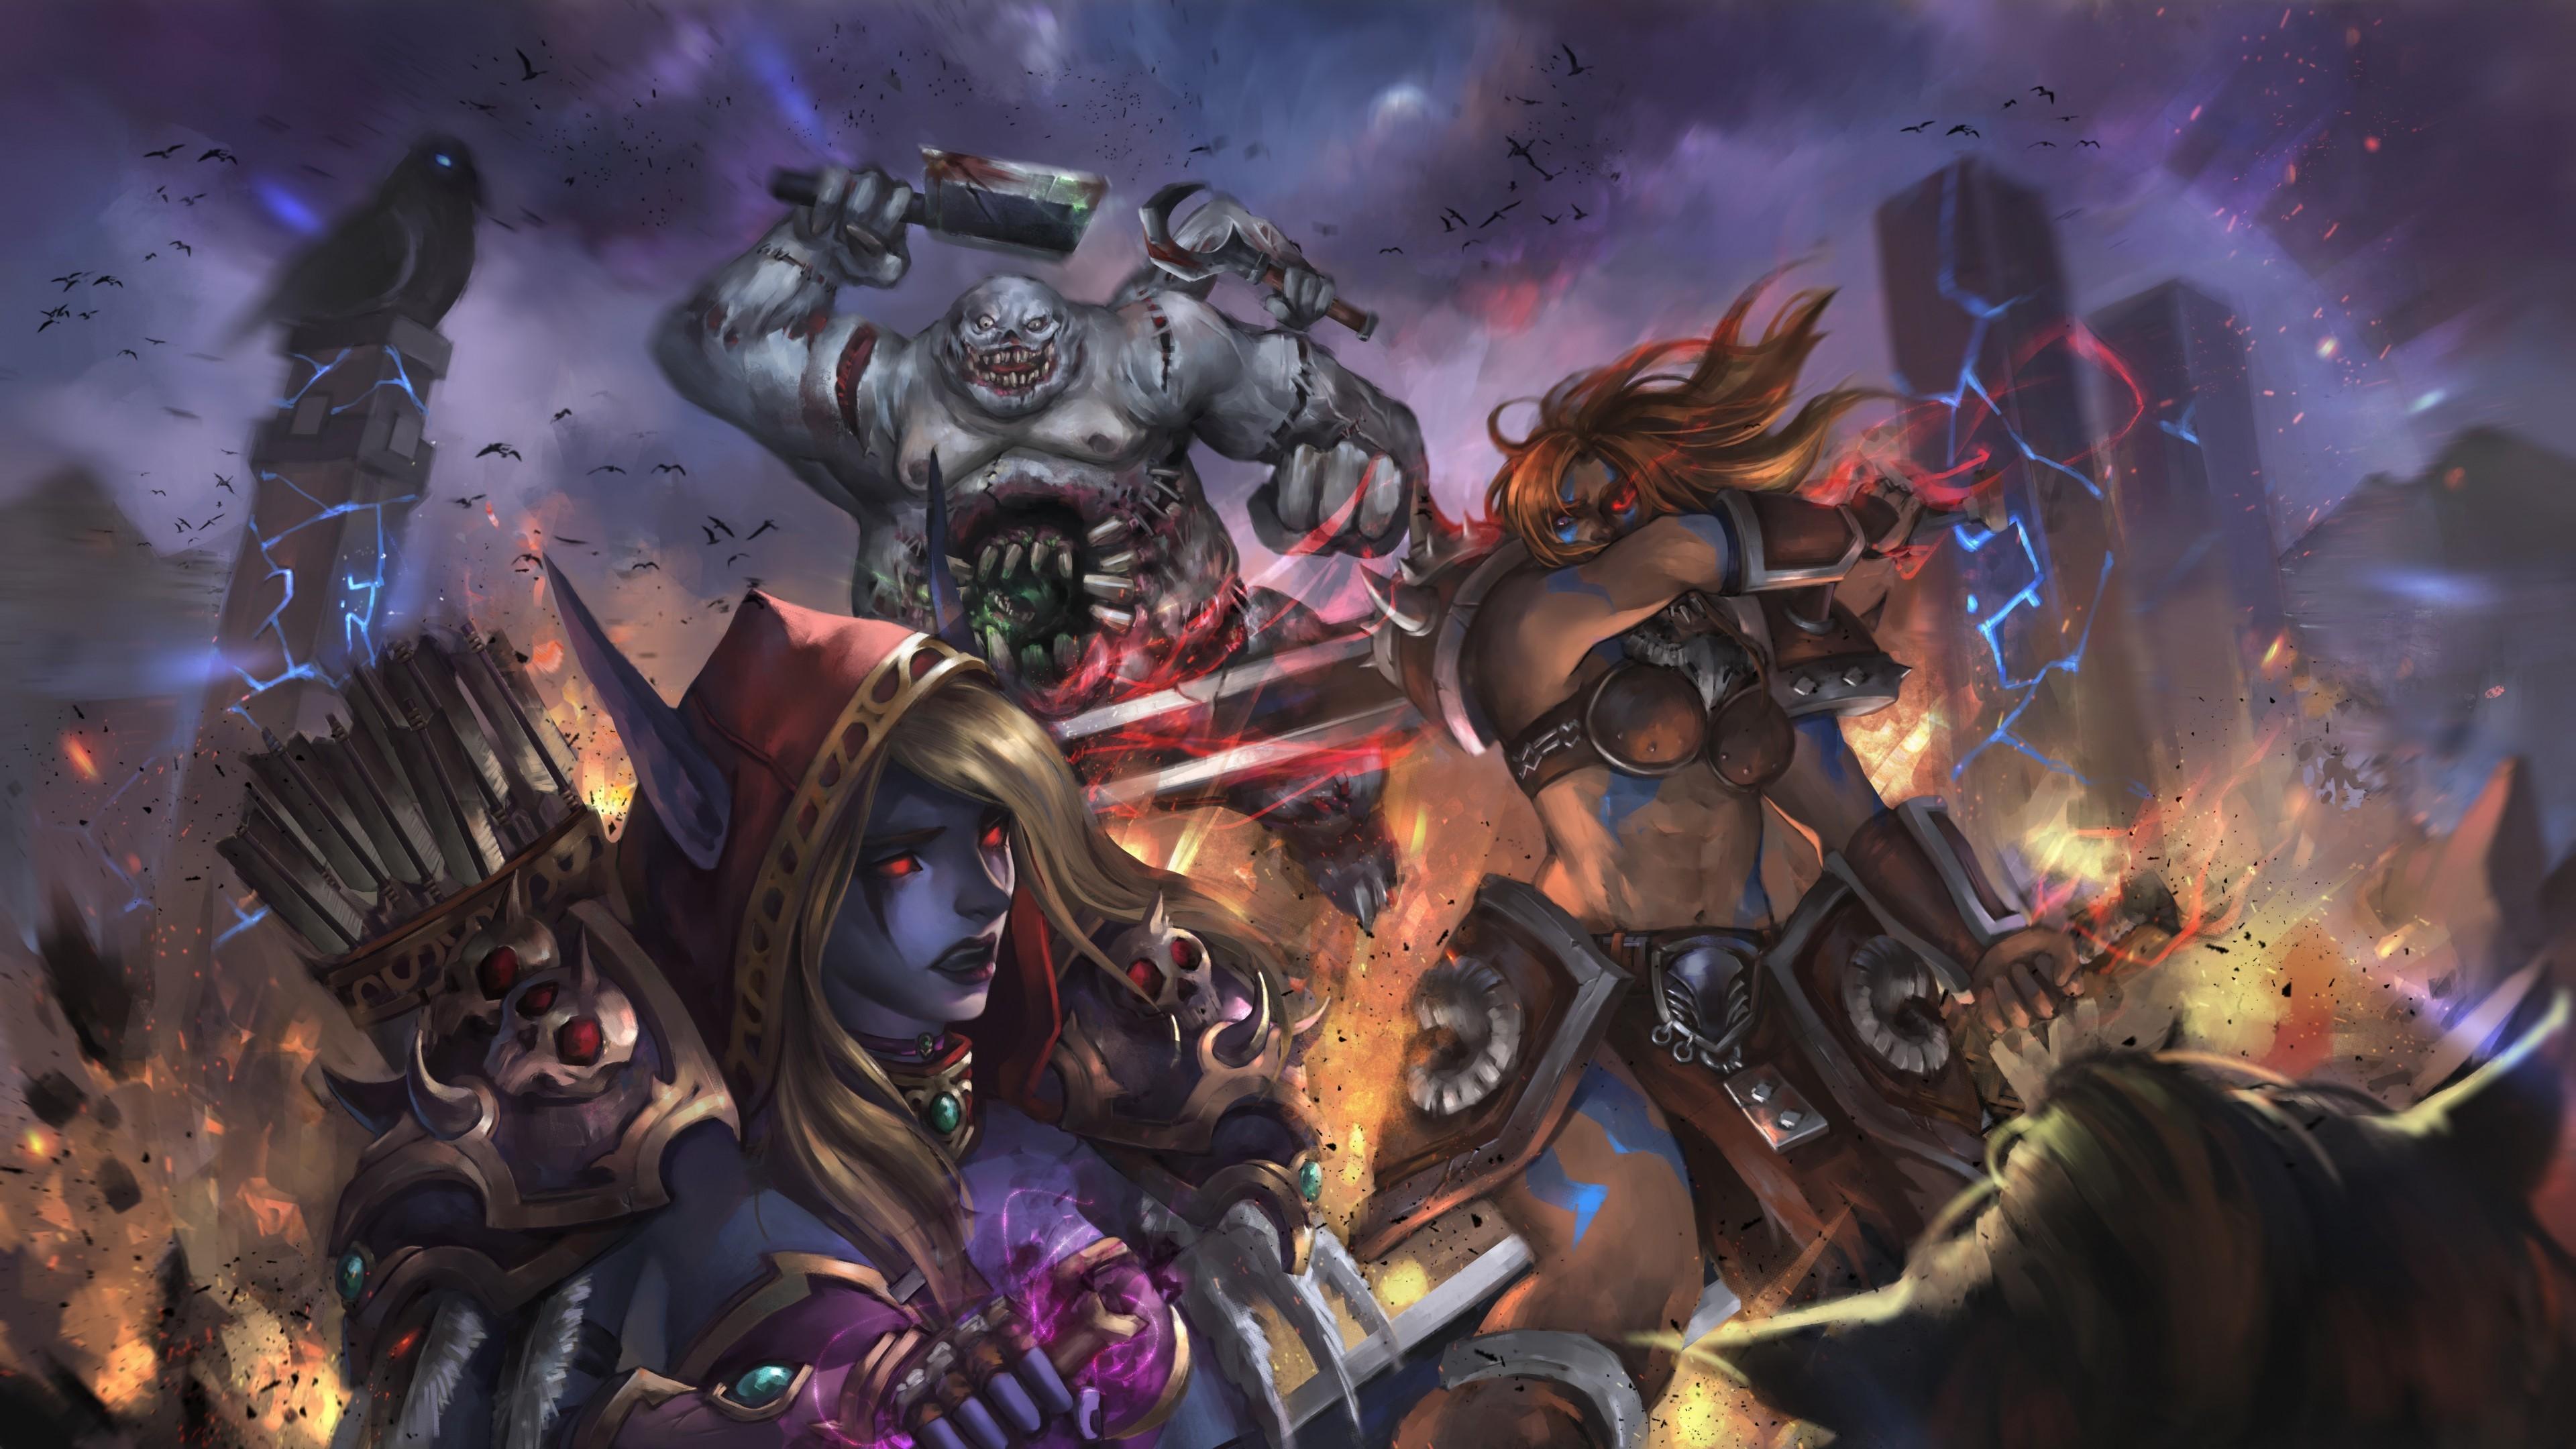 Heroes Of The Storm, Sylvanas Windrunner, Diablo Iii, Barbarian